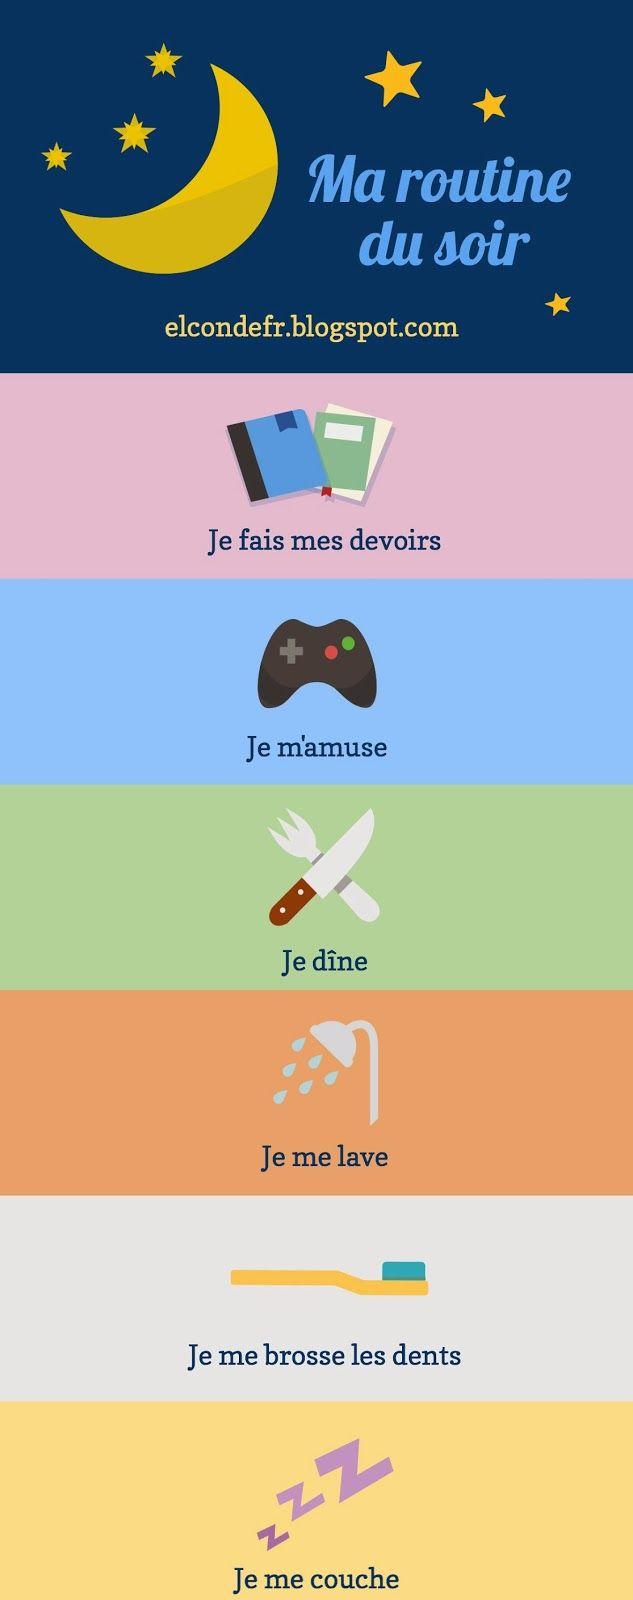 http://elcondefr.blogspot.com.es/2015/05/ma-routine-du-soir.html